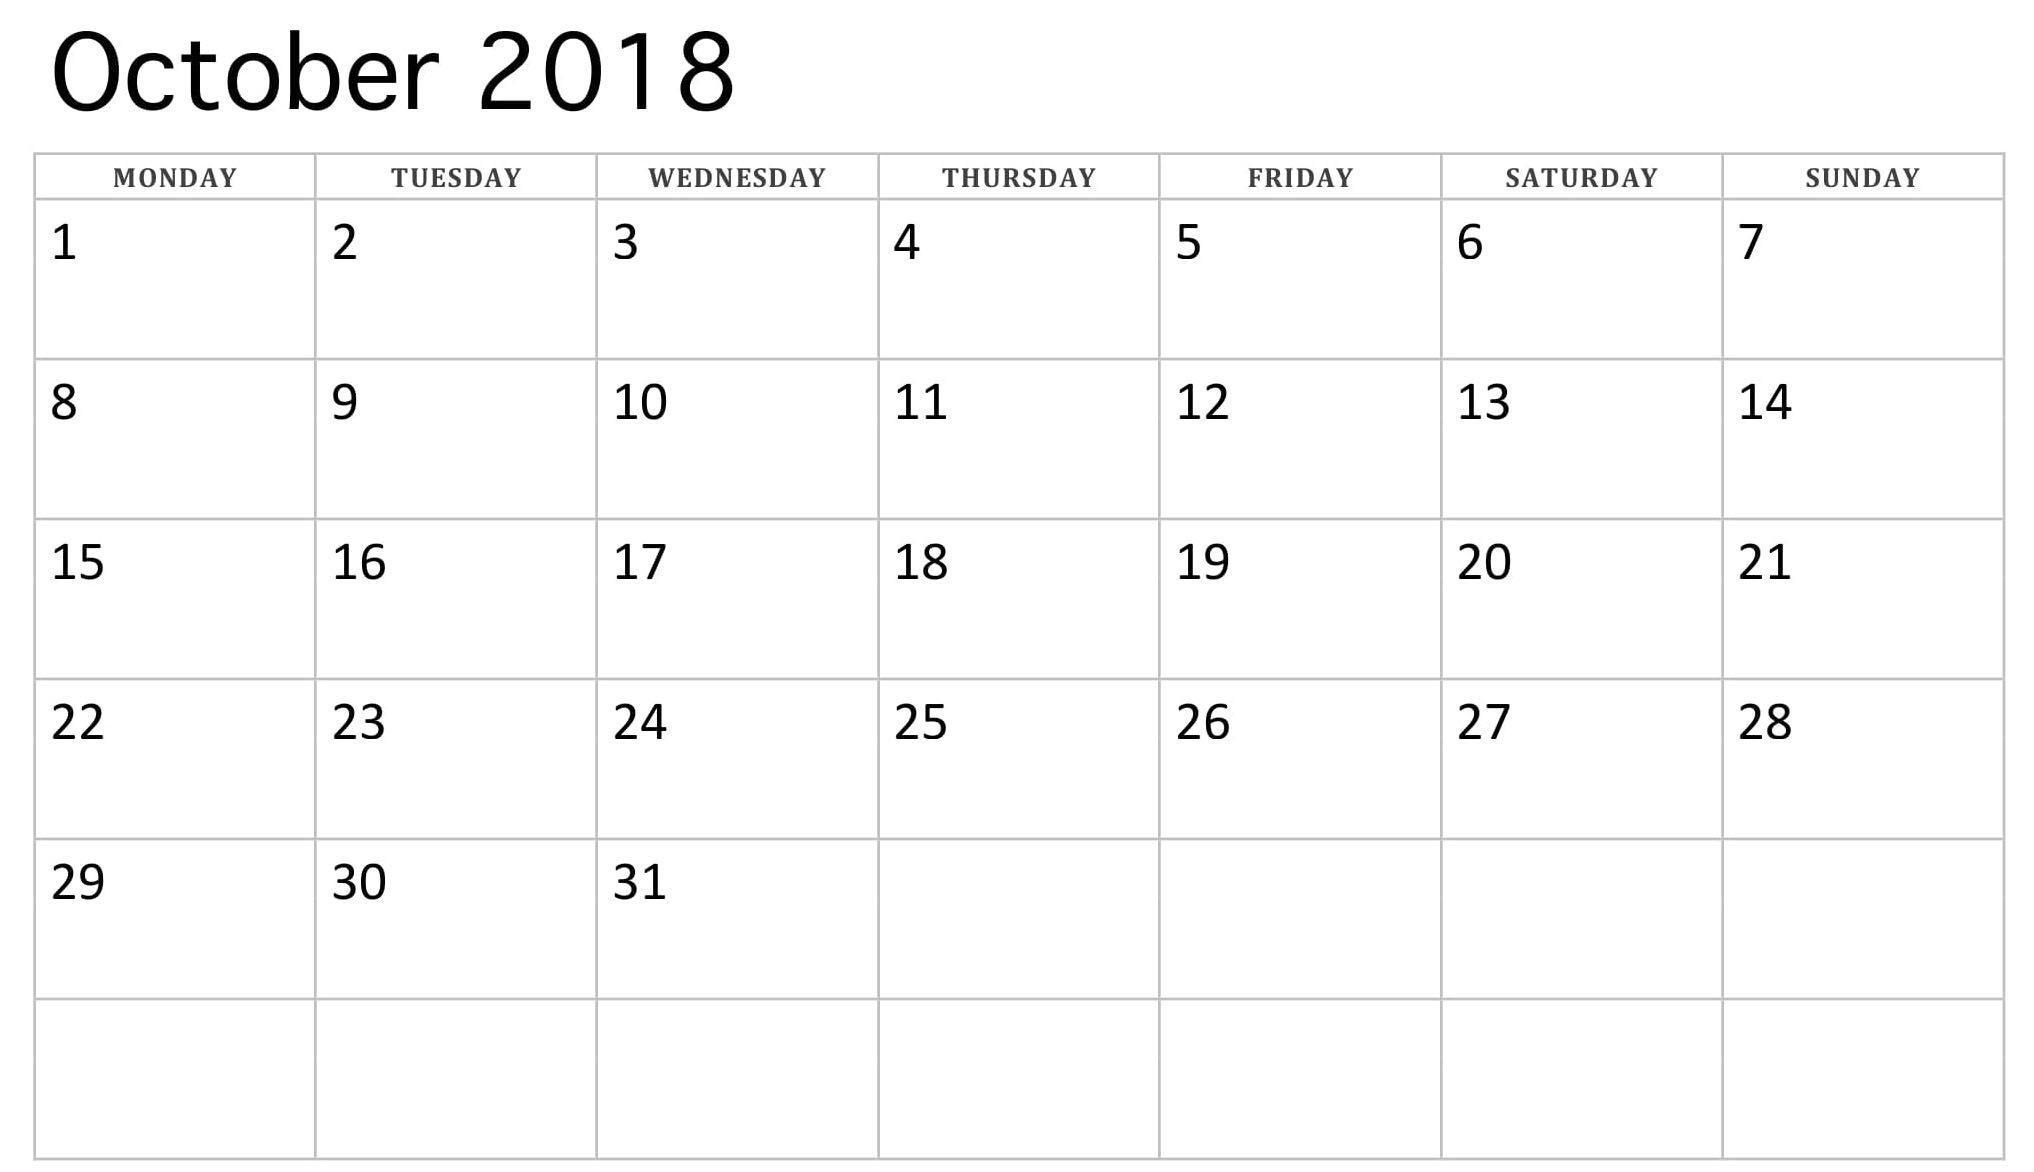 2018 October Monday Starting Calendar | 2018 Calendars